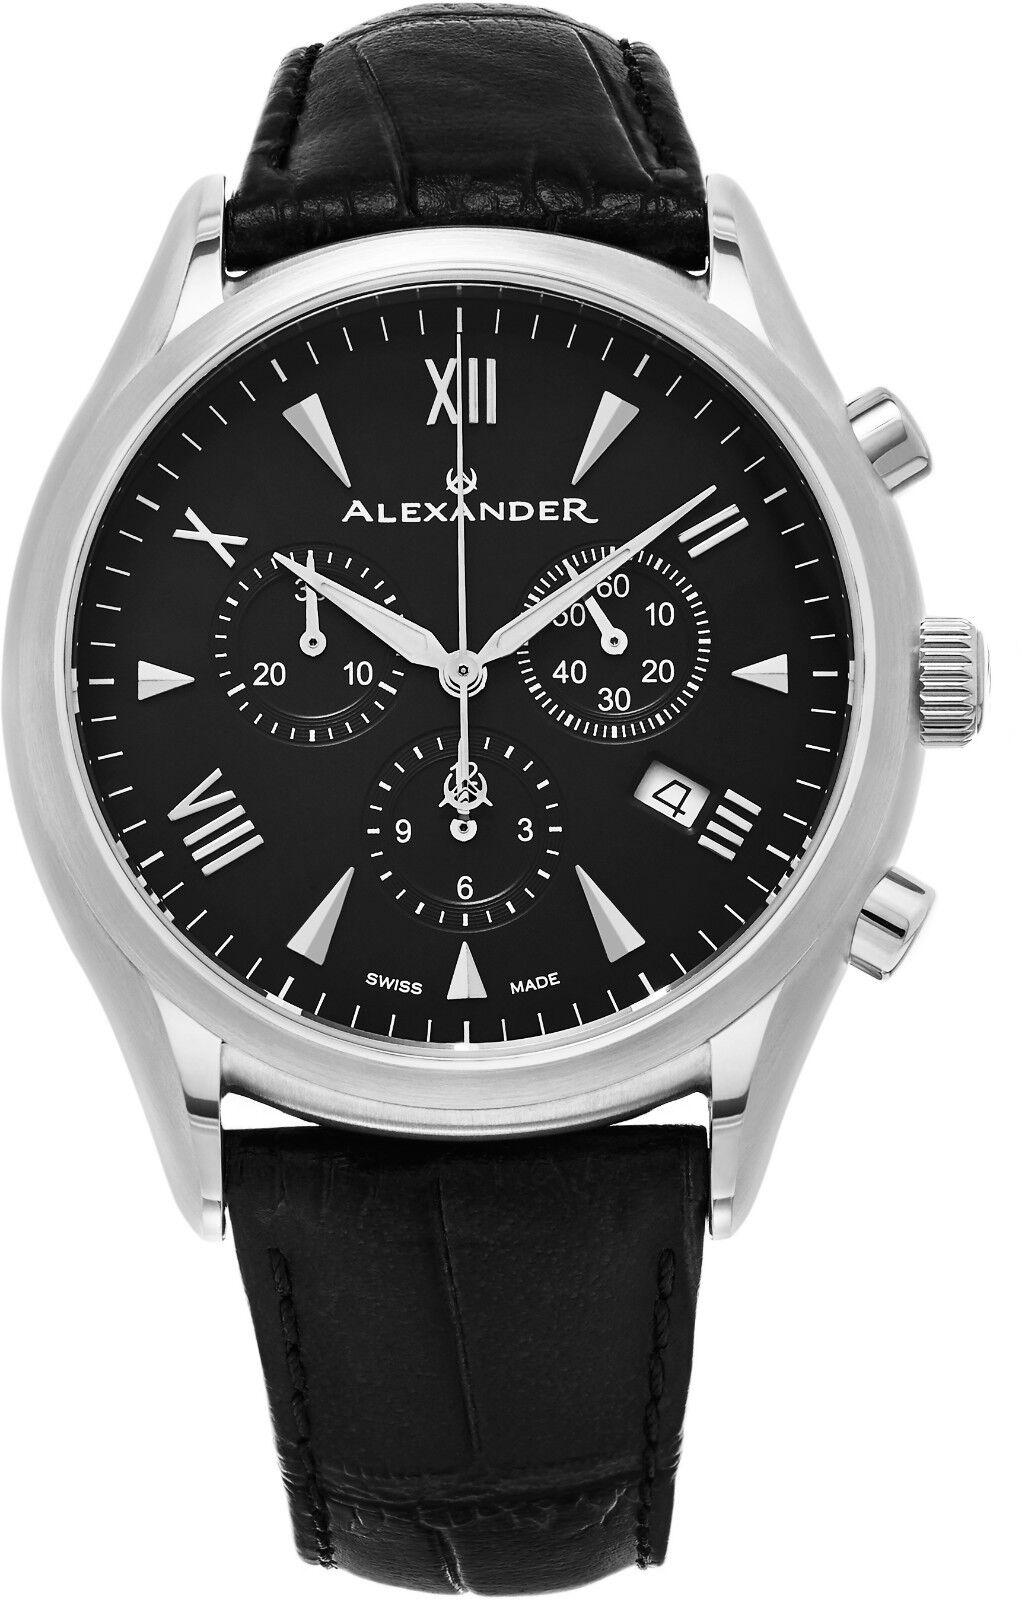 Alexander Pella Multi-Function Swiss Made Leather Strap Men's Chronograph Watch